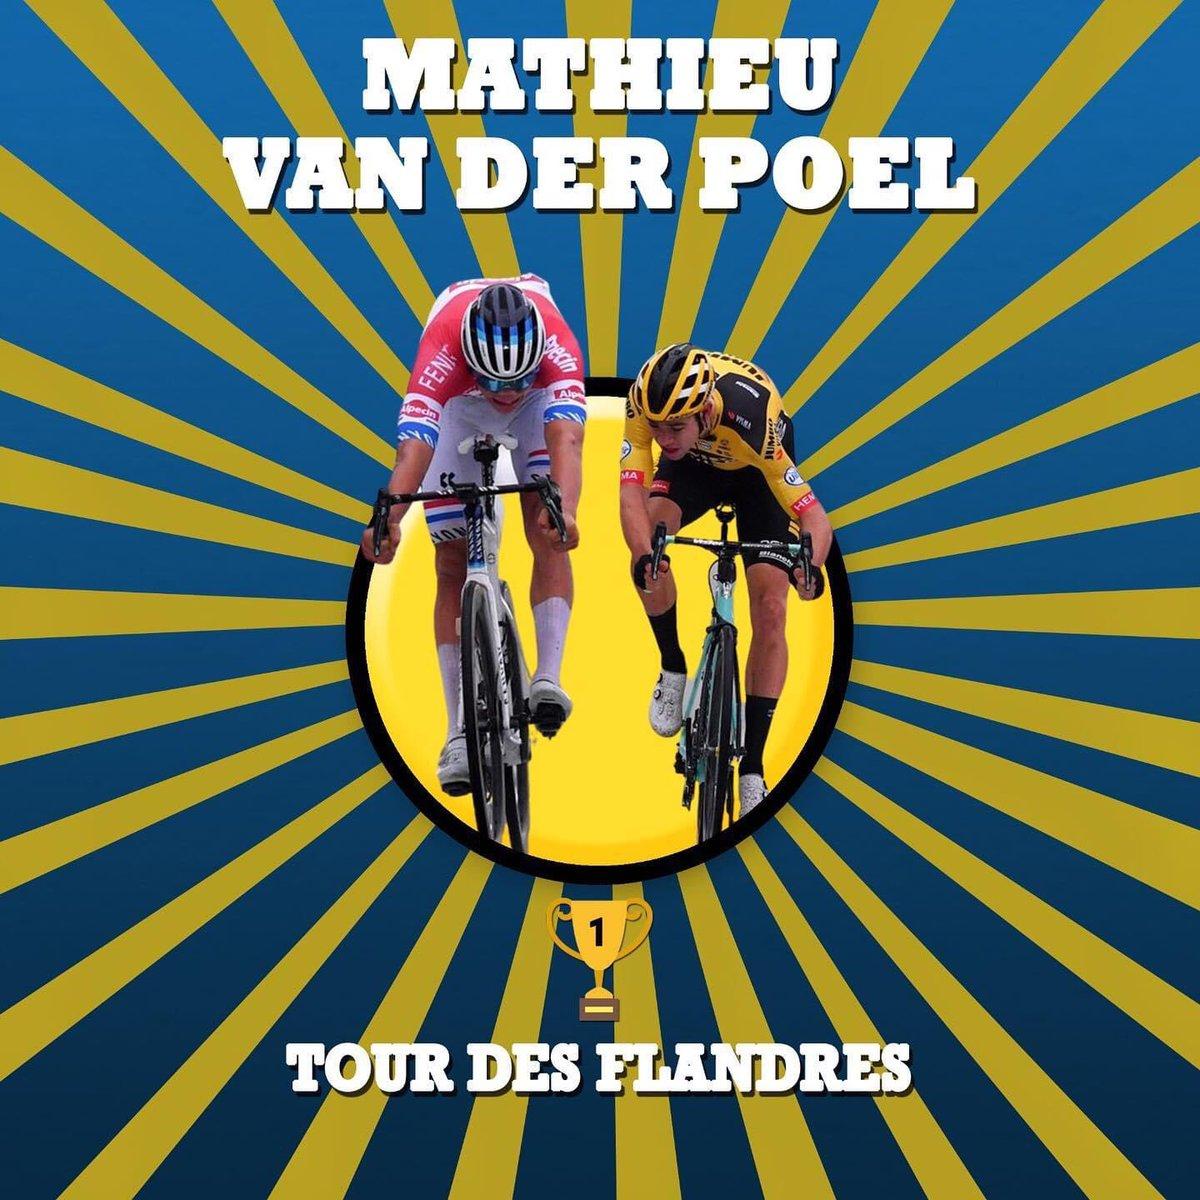 🚴♂️L'omaggio di #Fantacycling a Mathieu Van der Poel, vincitore del Giro delle Fiandre 🚀 #RVV2020 #LaRonde #GirodelleFiandre #VDP #VanderPoel https://t.co/SZbV9XbC6r